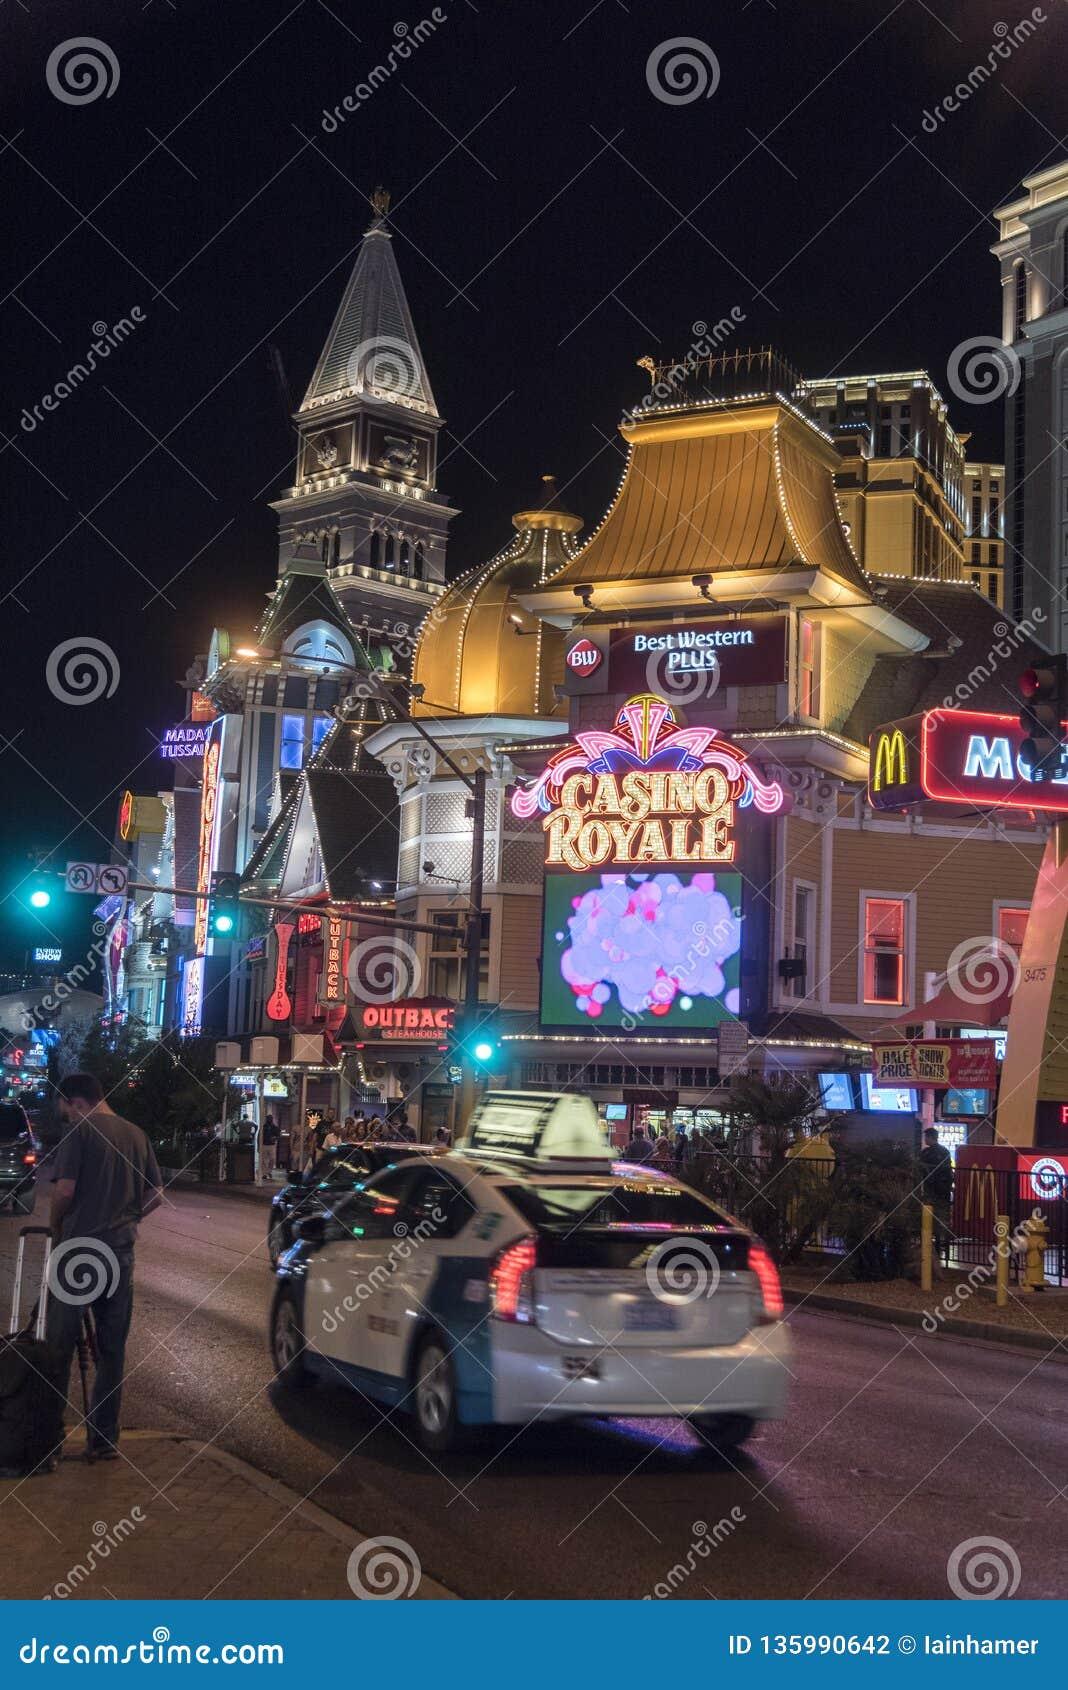 Free spin casinos